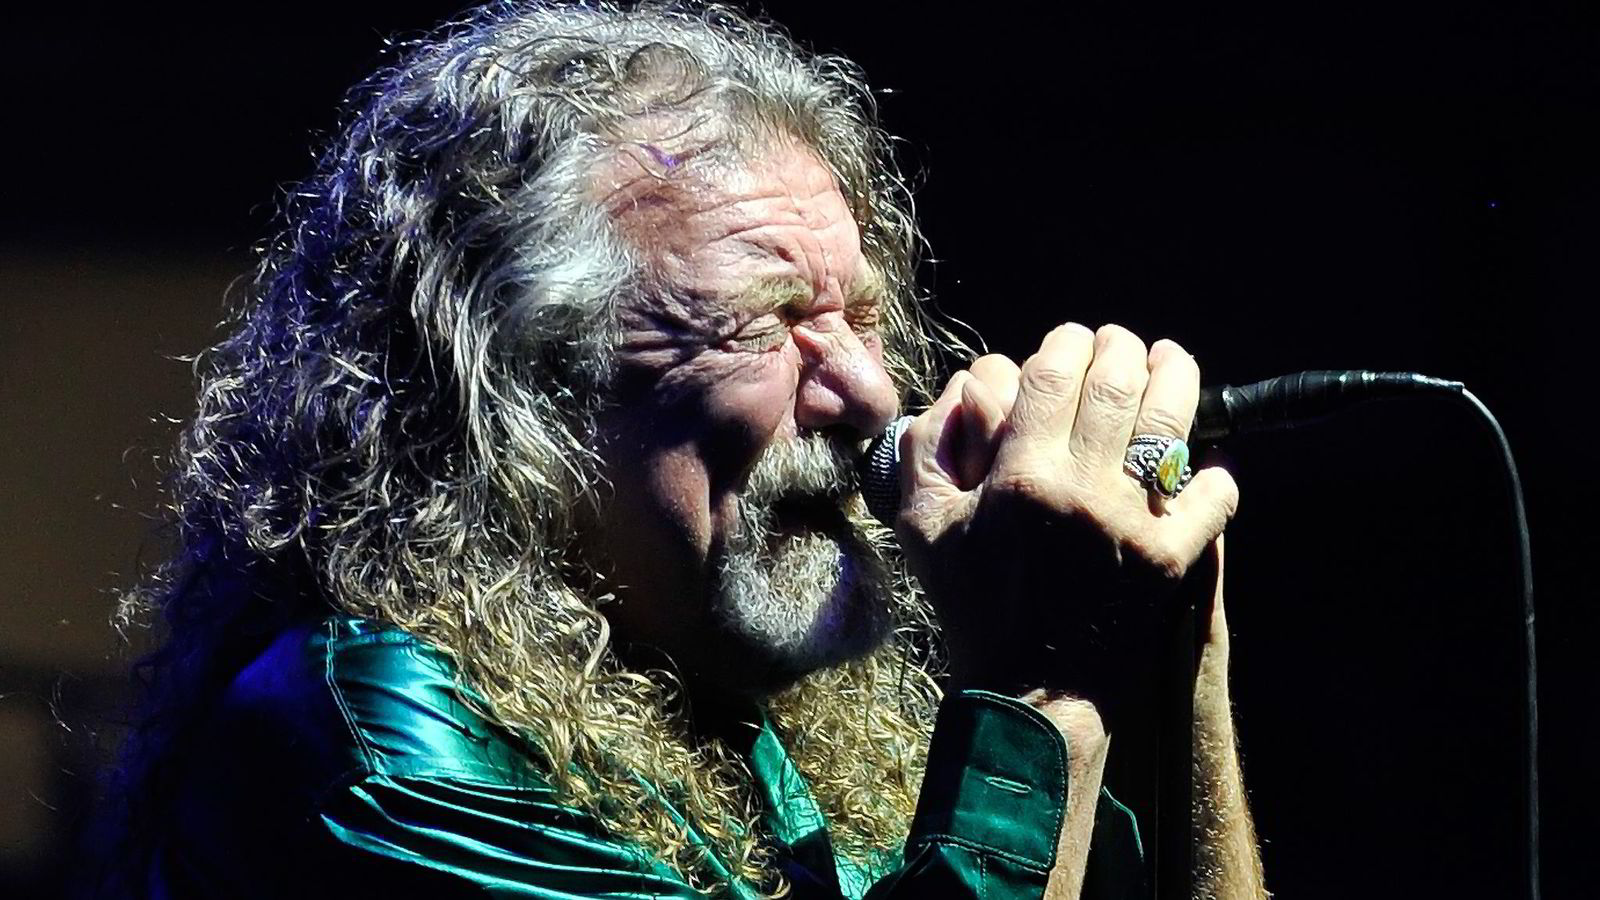 Tidligere Led Zeppelin-medlem Robert Plant trakk for lite publikum til Molde-Jazz. Foto: Vaclav Salek, AP/NTB Scanpix